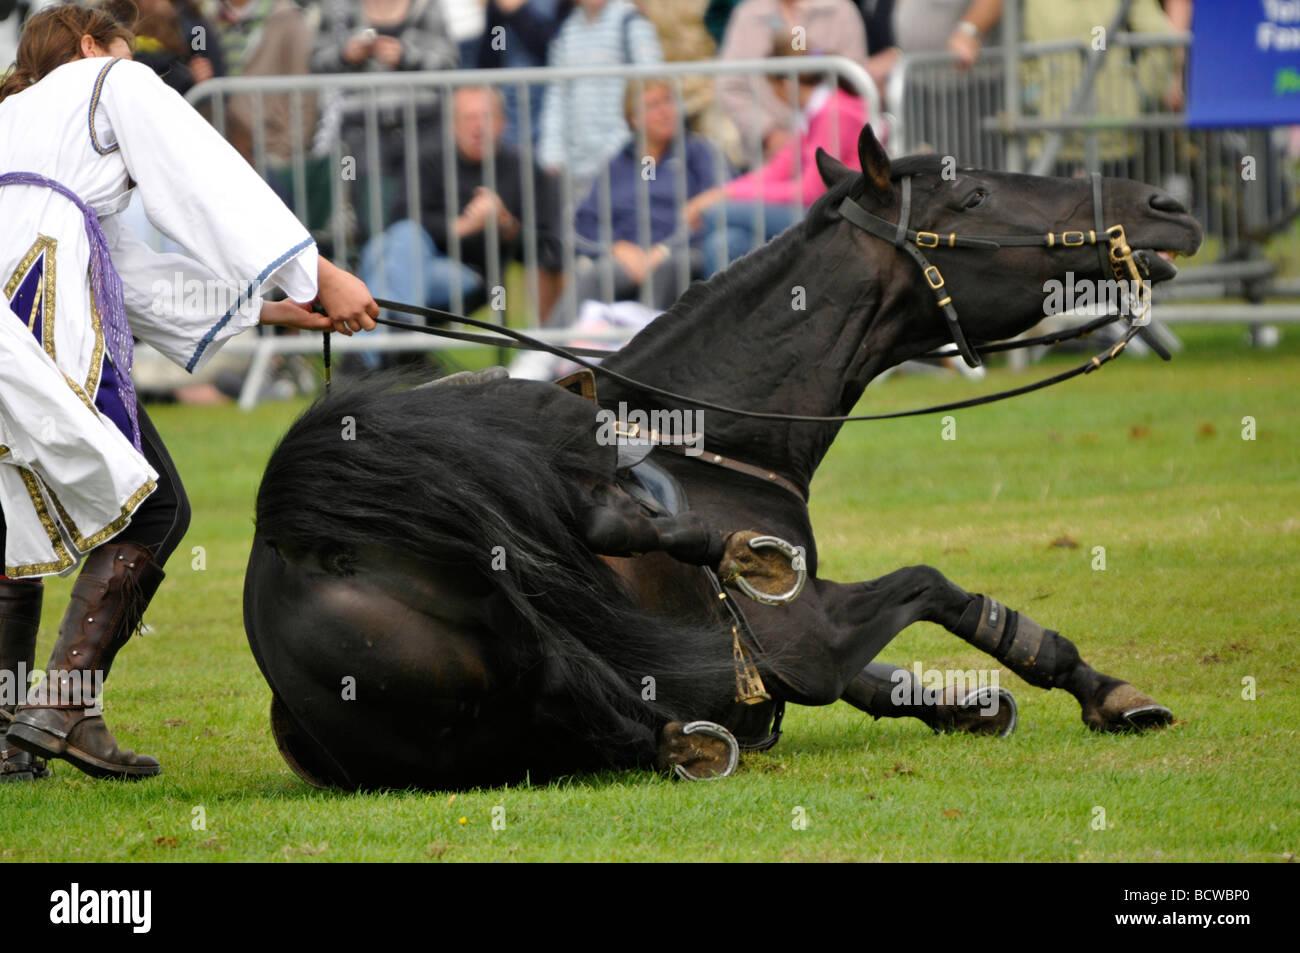 Horse riding display Cromer Carnival East Anglia Norfolk England - Stock Image